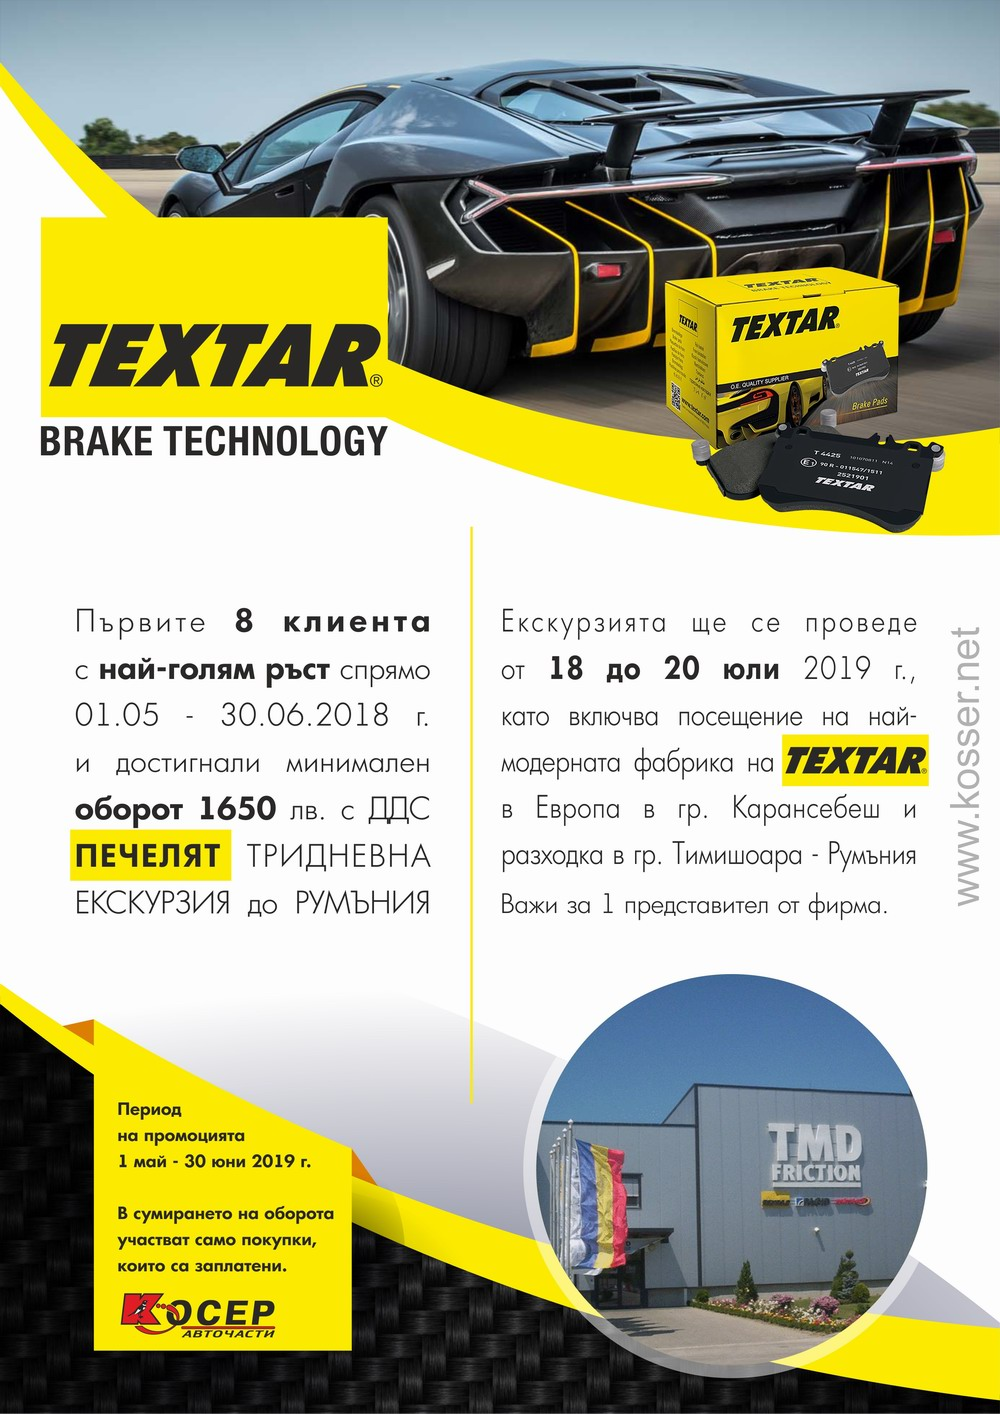 Промоция TEXTAR, 01.05.2019 - 30.06.2019